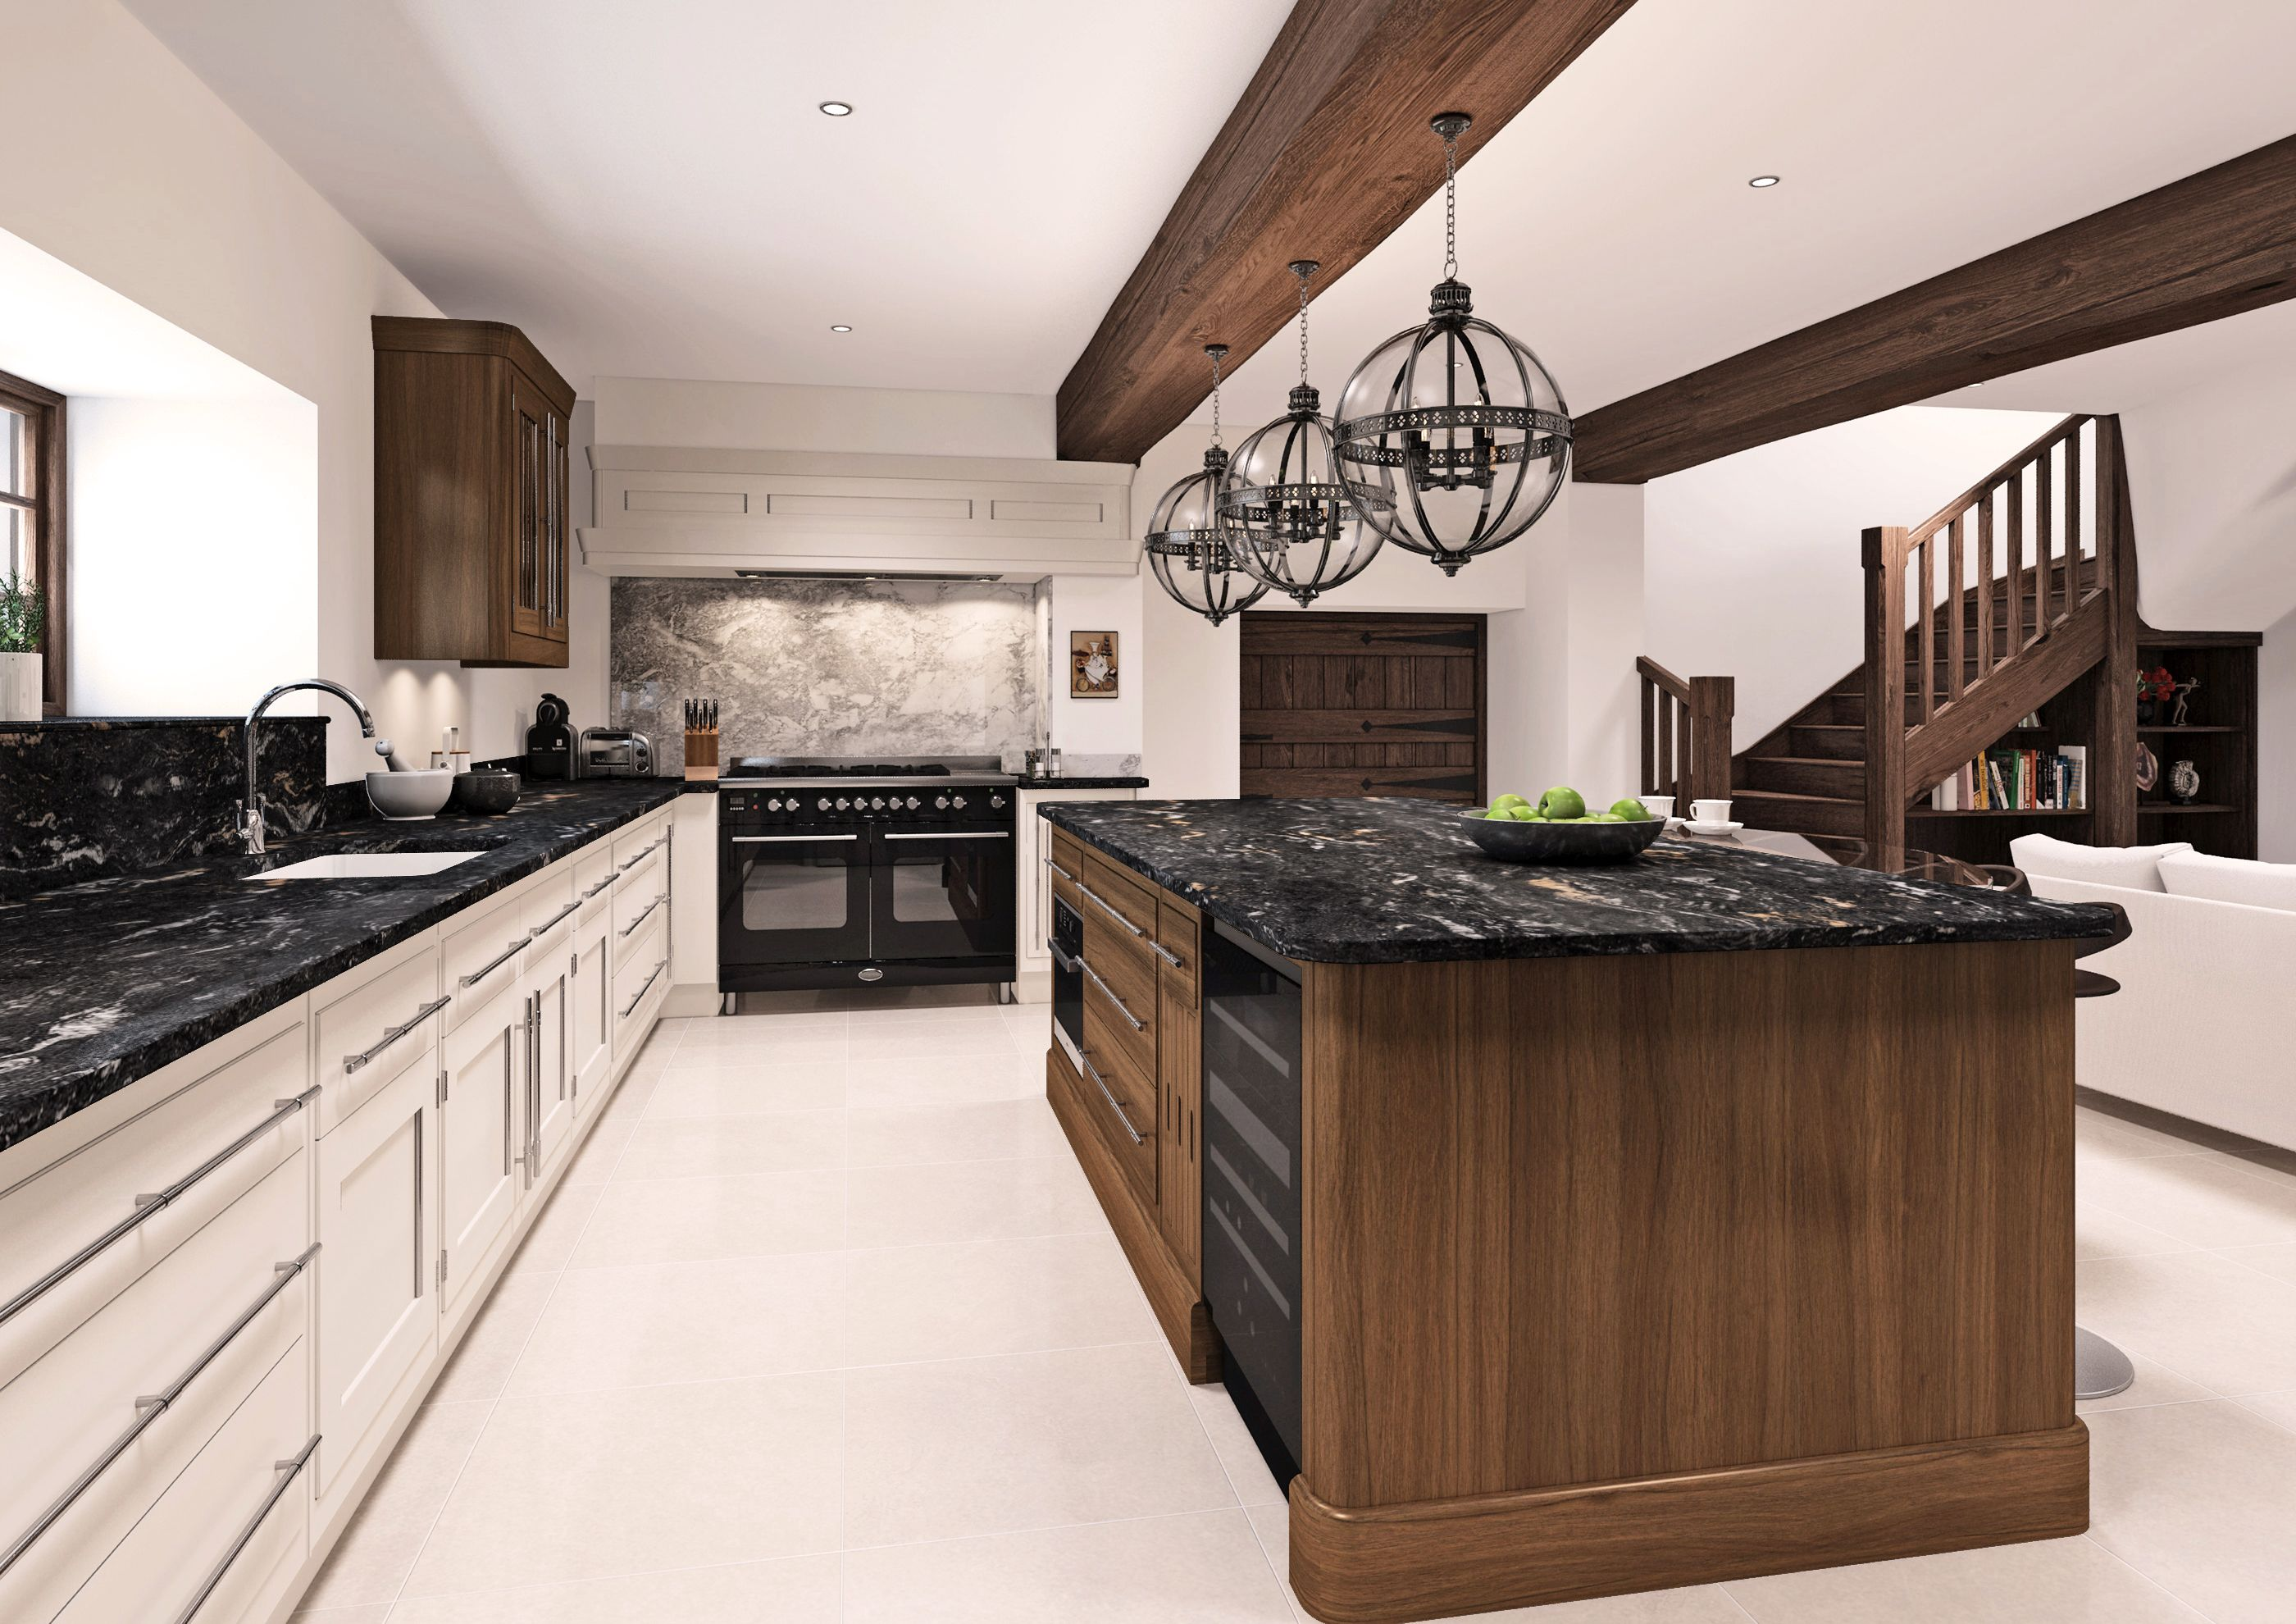 Mark Wilkinson Milan Kitchen CGI Kitchen, Home decor, Decor